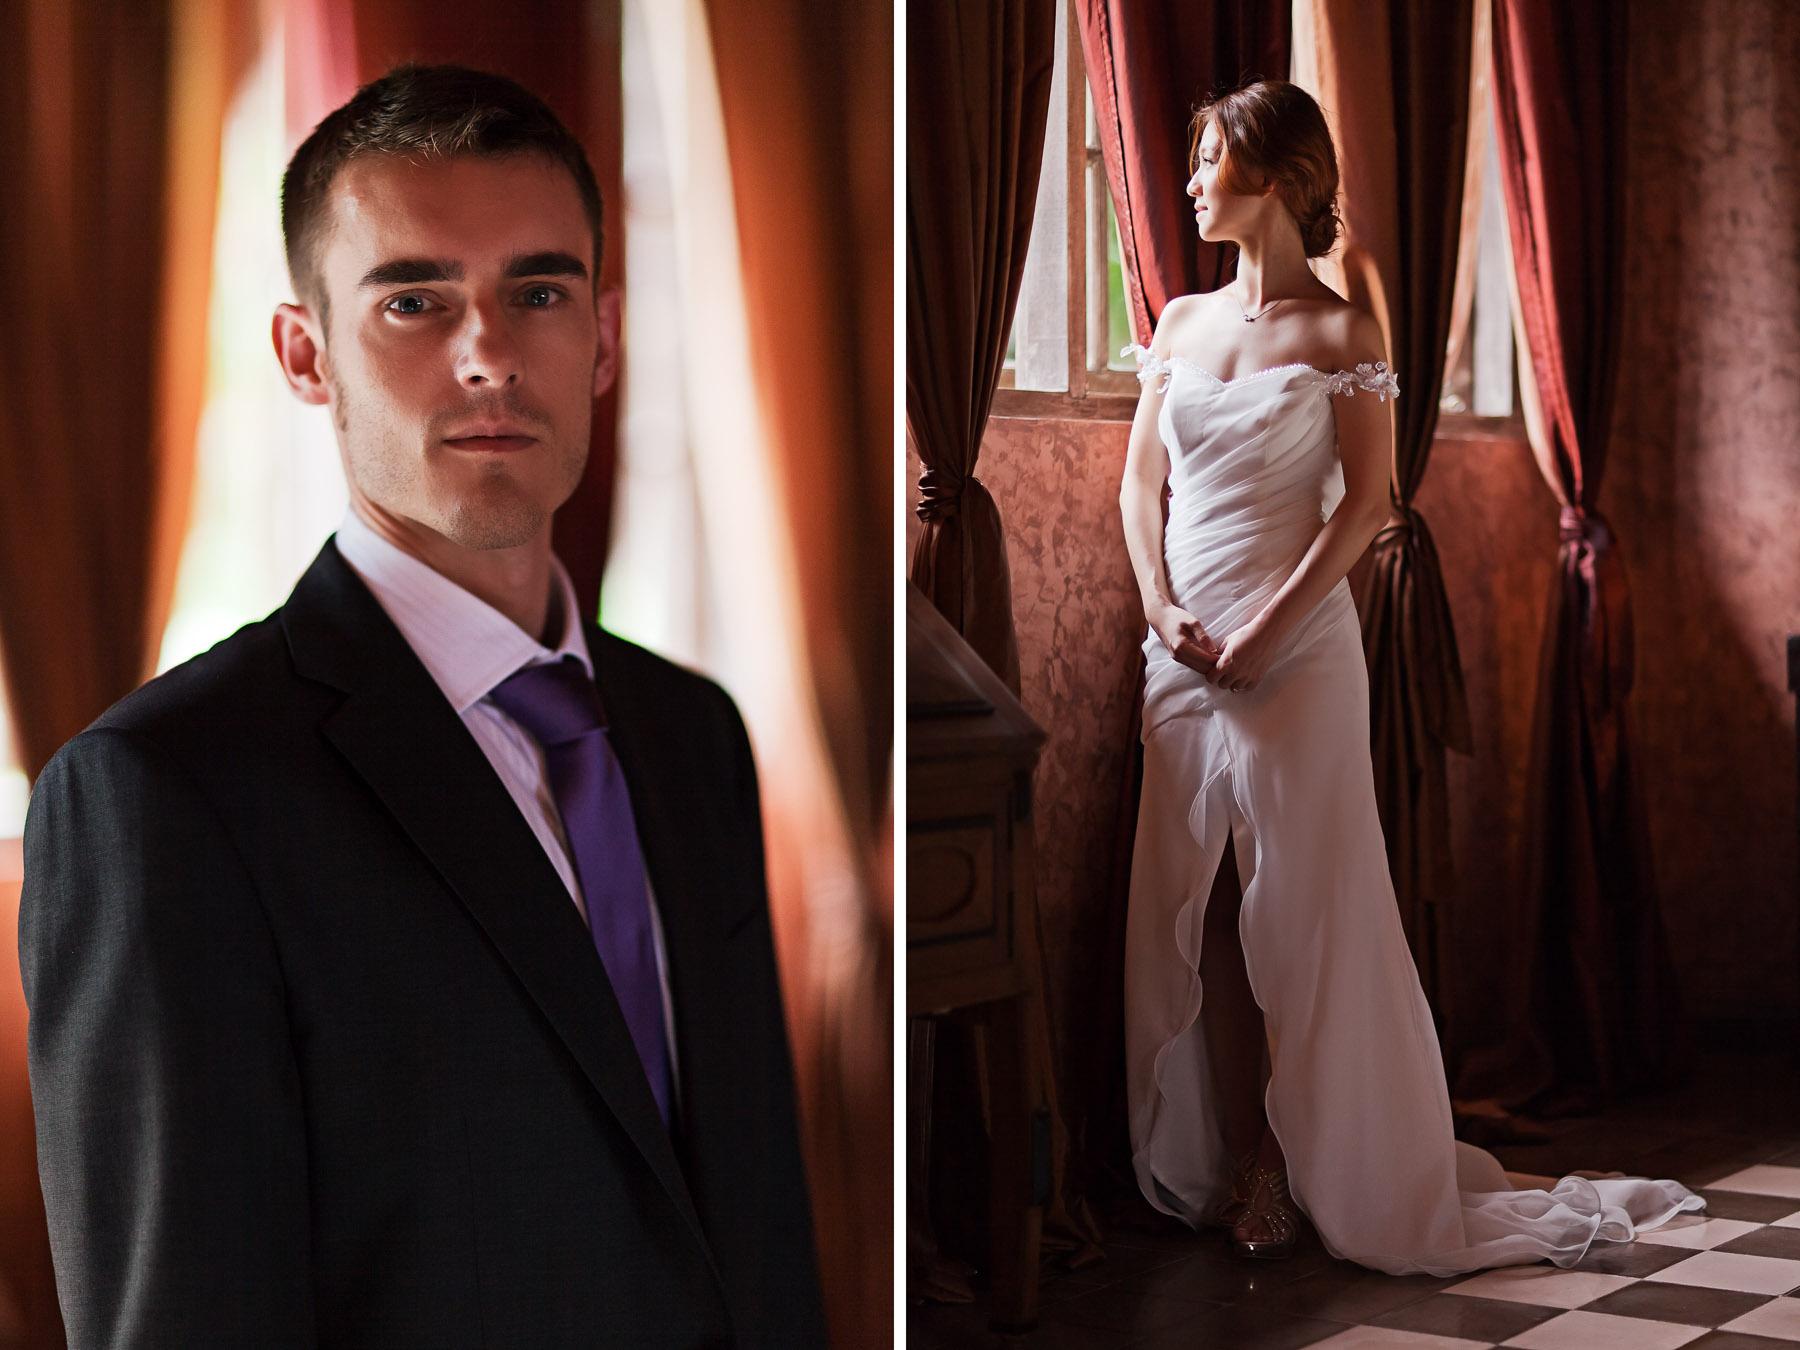 Natalie & Ben's Portraits Bali 09.jpg